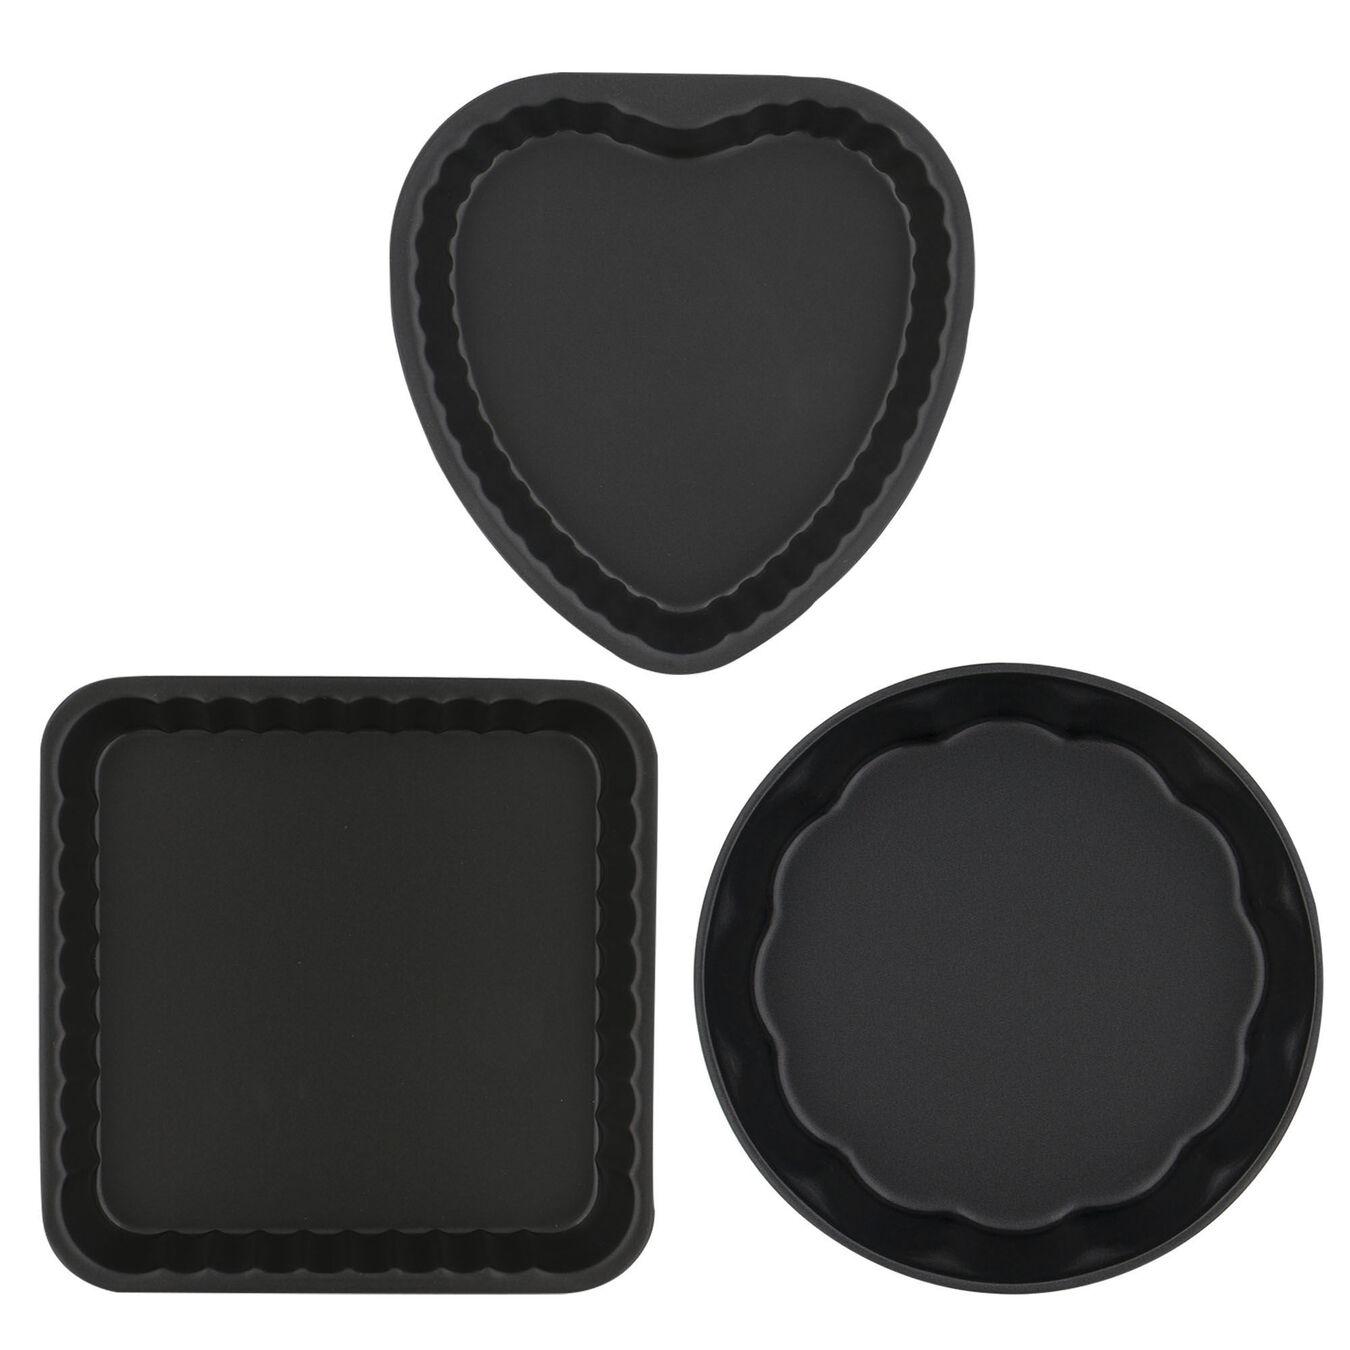 3-pcBakeware set,,large 1